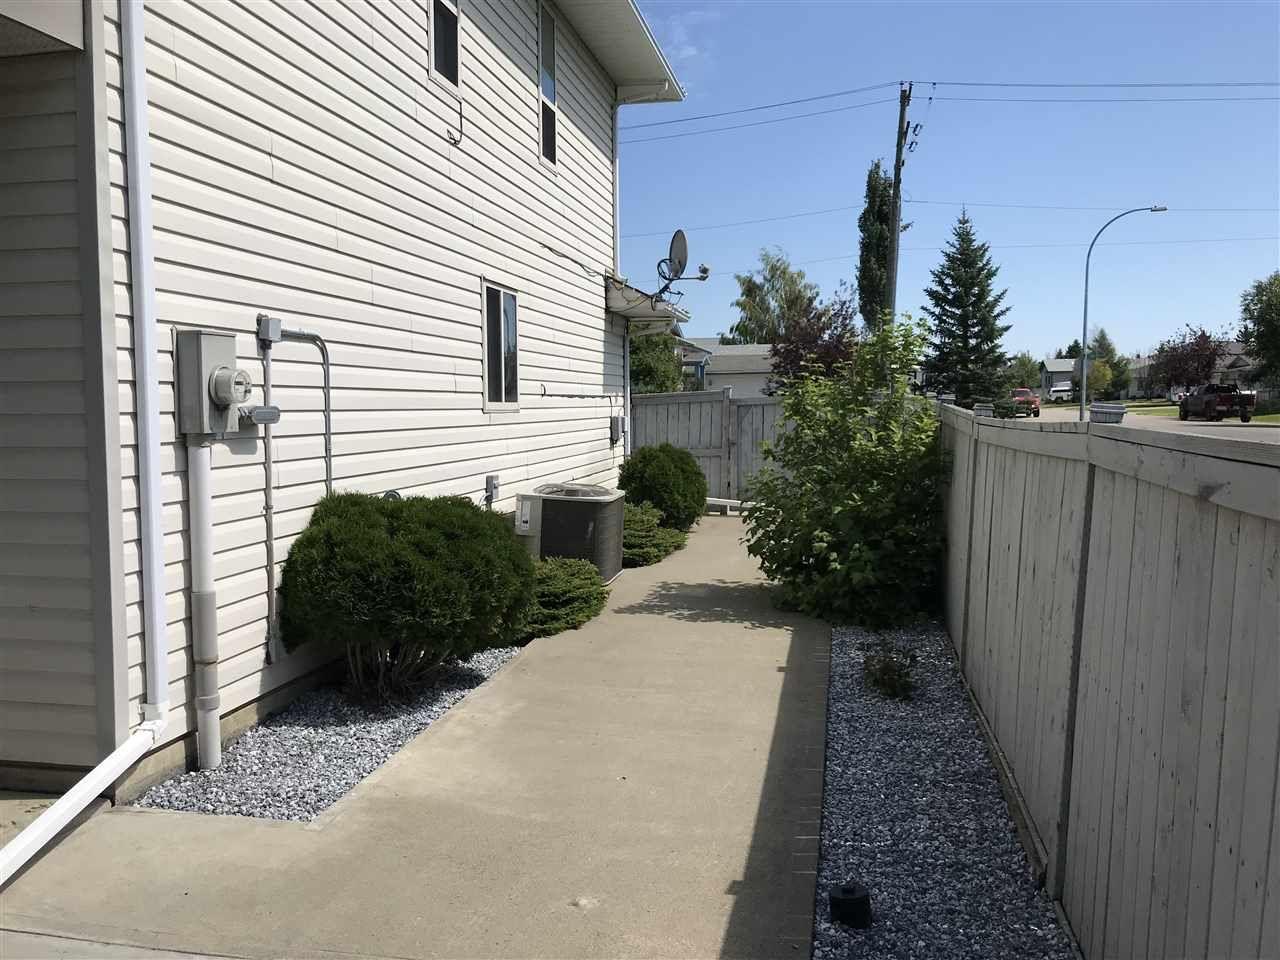 Photo 19: Photos: 11404 108 Street in Fort St. John: Fort St. John - City NW House for sale (Fort St. John (Zone 60))  : MLS®# R2540806